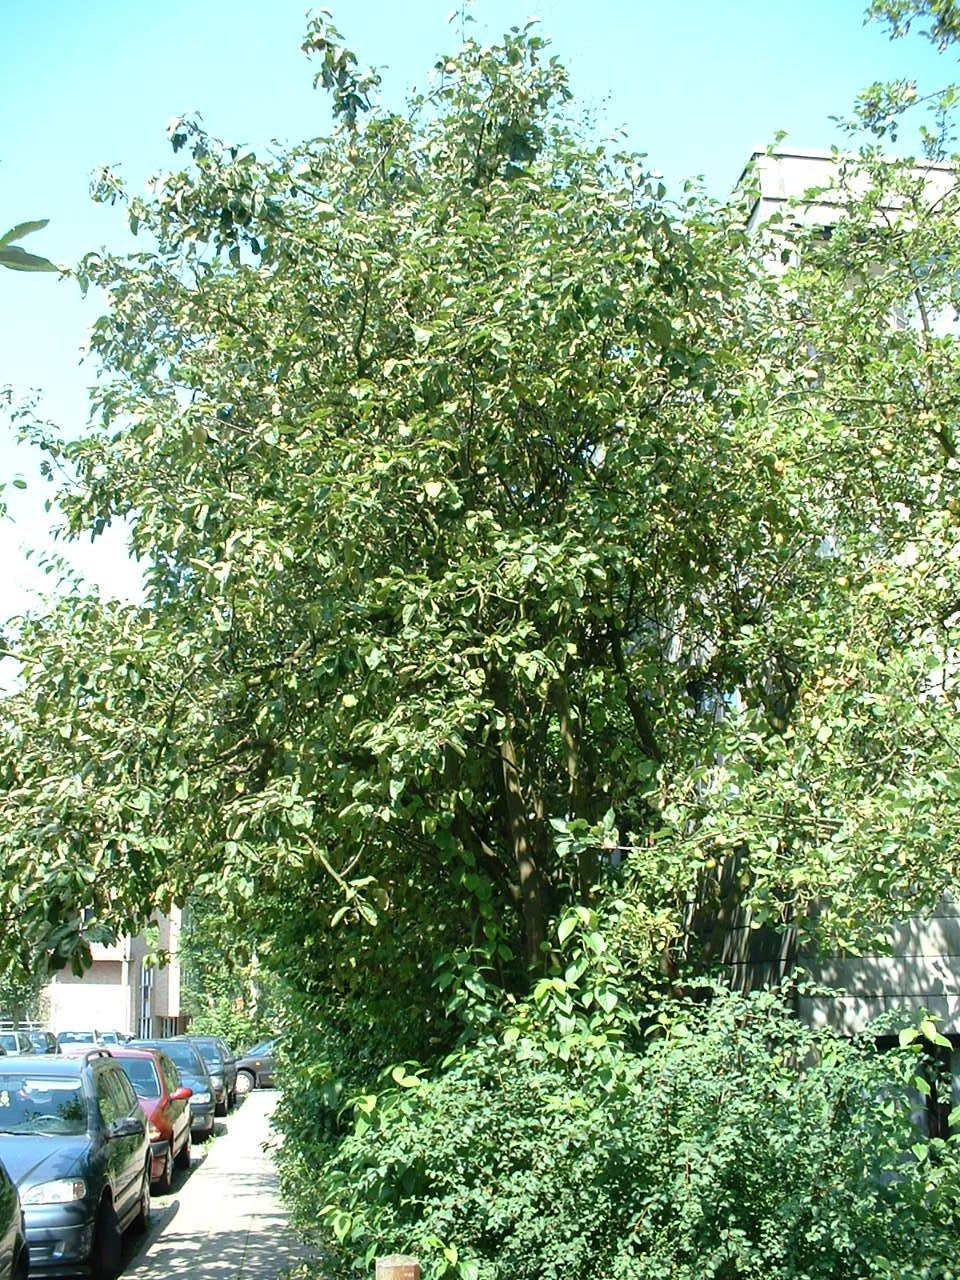 Kweepeer – St.- Lambrechts - Woluwe, Ideaallaan, 9 –  13 August 2002